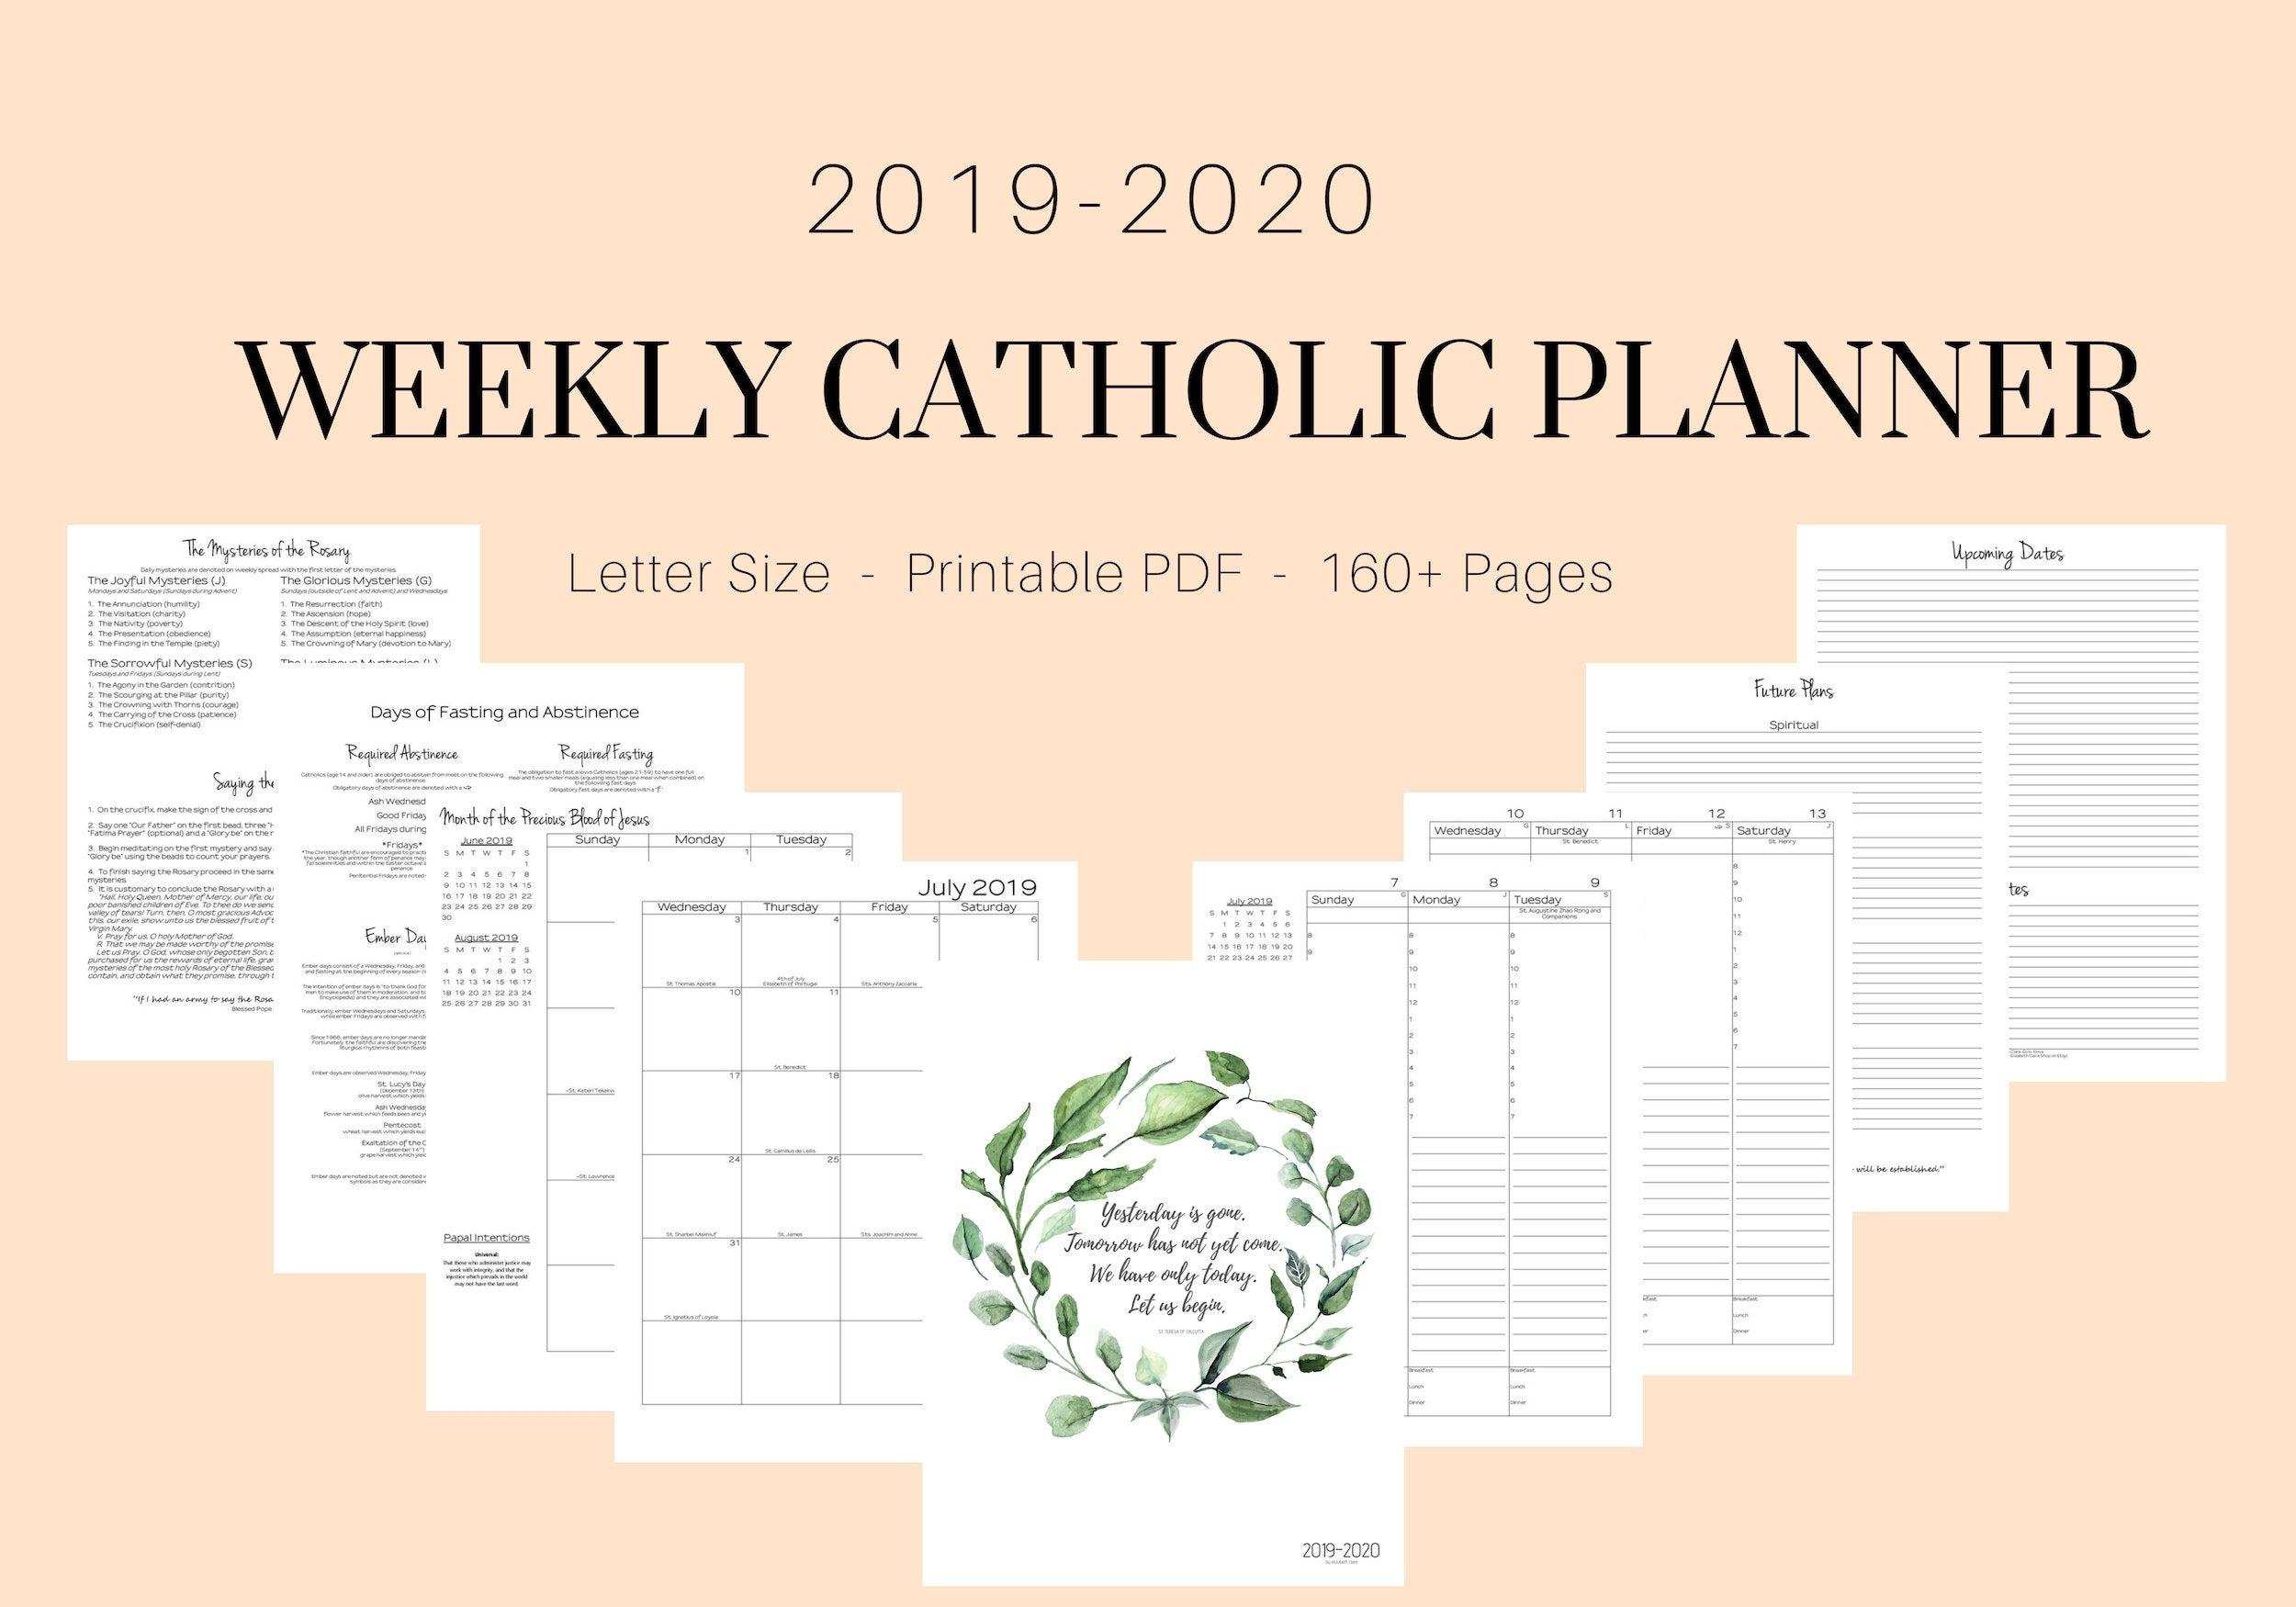 2019 2020 Catholic Planner Weekly Printable: Daily Planner | Etsy pertaining to Catholic Liturgical Calendar 2020 Pdf